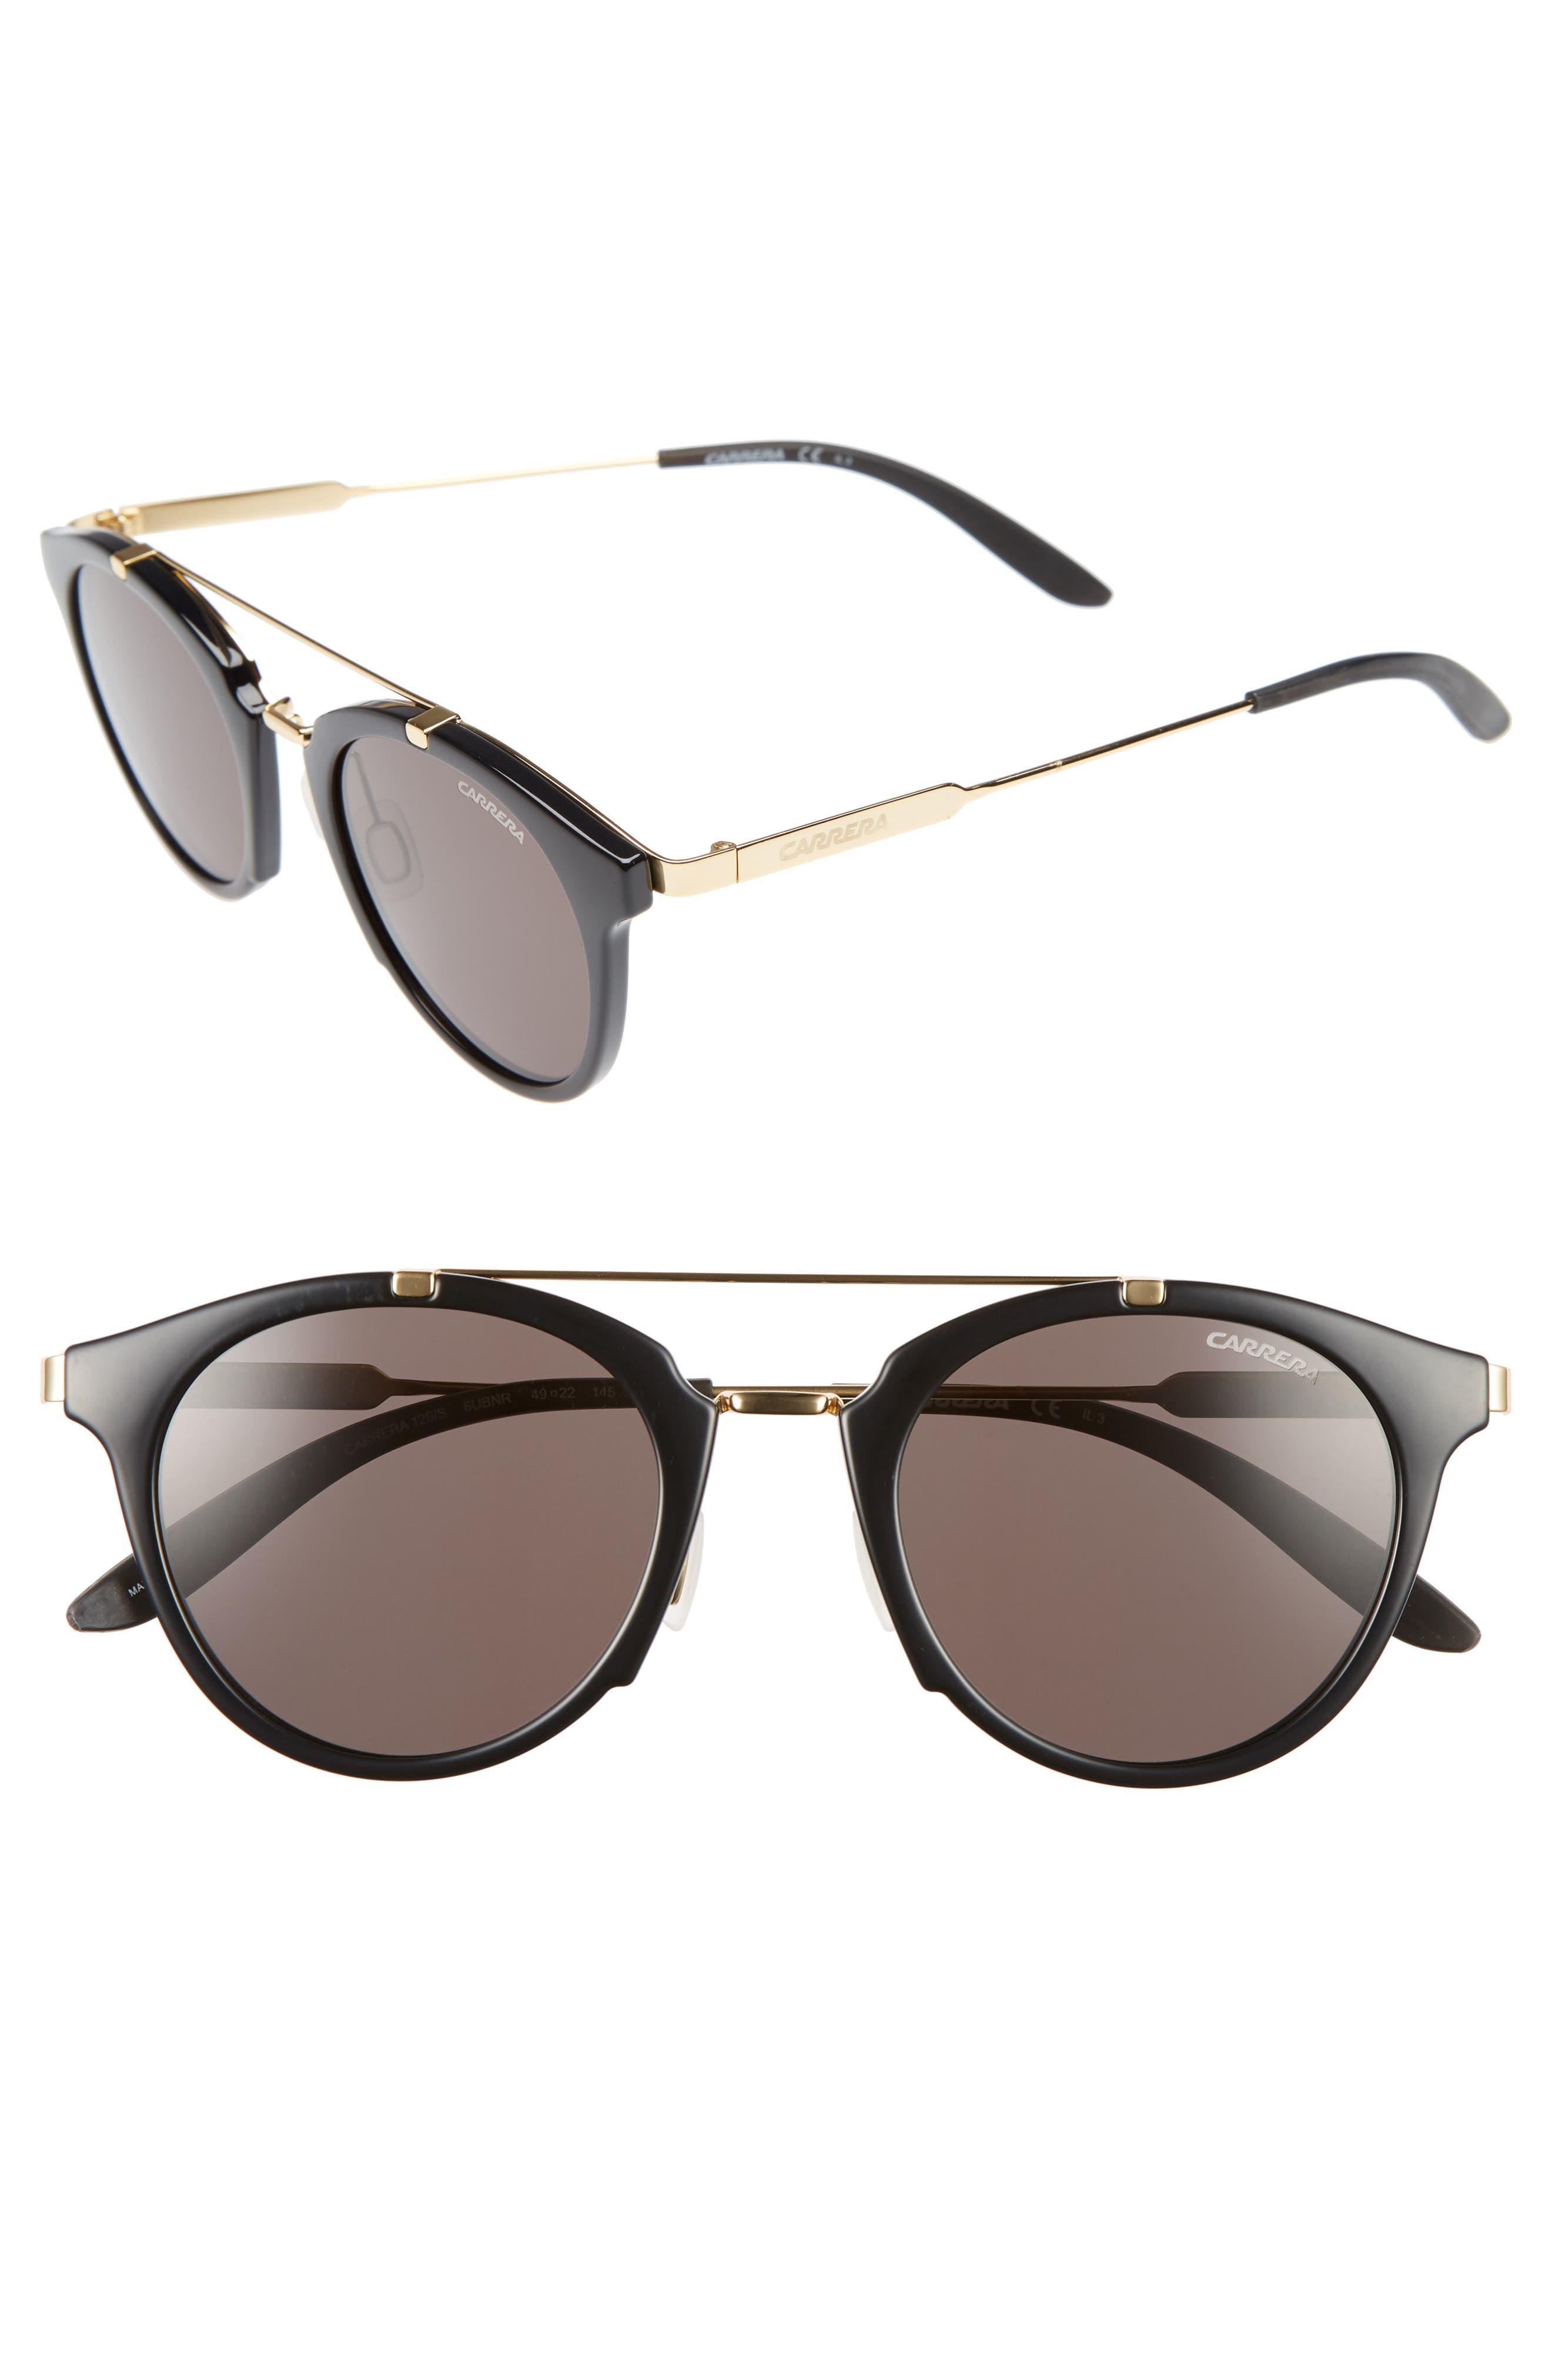 Carrera 126 49mm Sunglasses,                             Alternate thumbnail 2, color,                             001